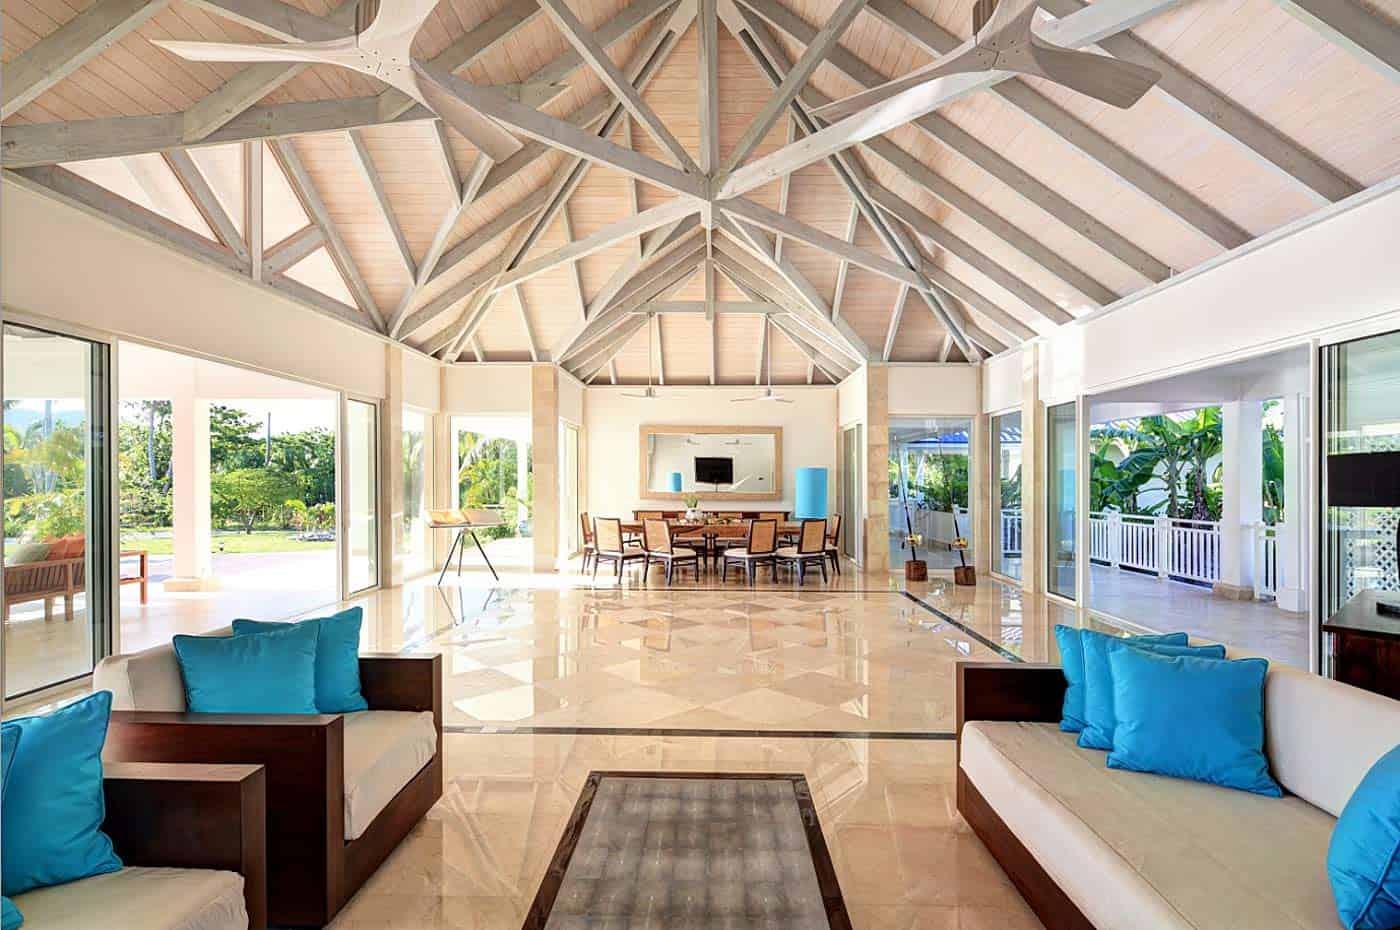 Inside main building of Bora Bora One resort vacation rental | boraboraphotos.com